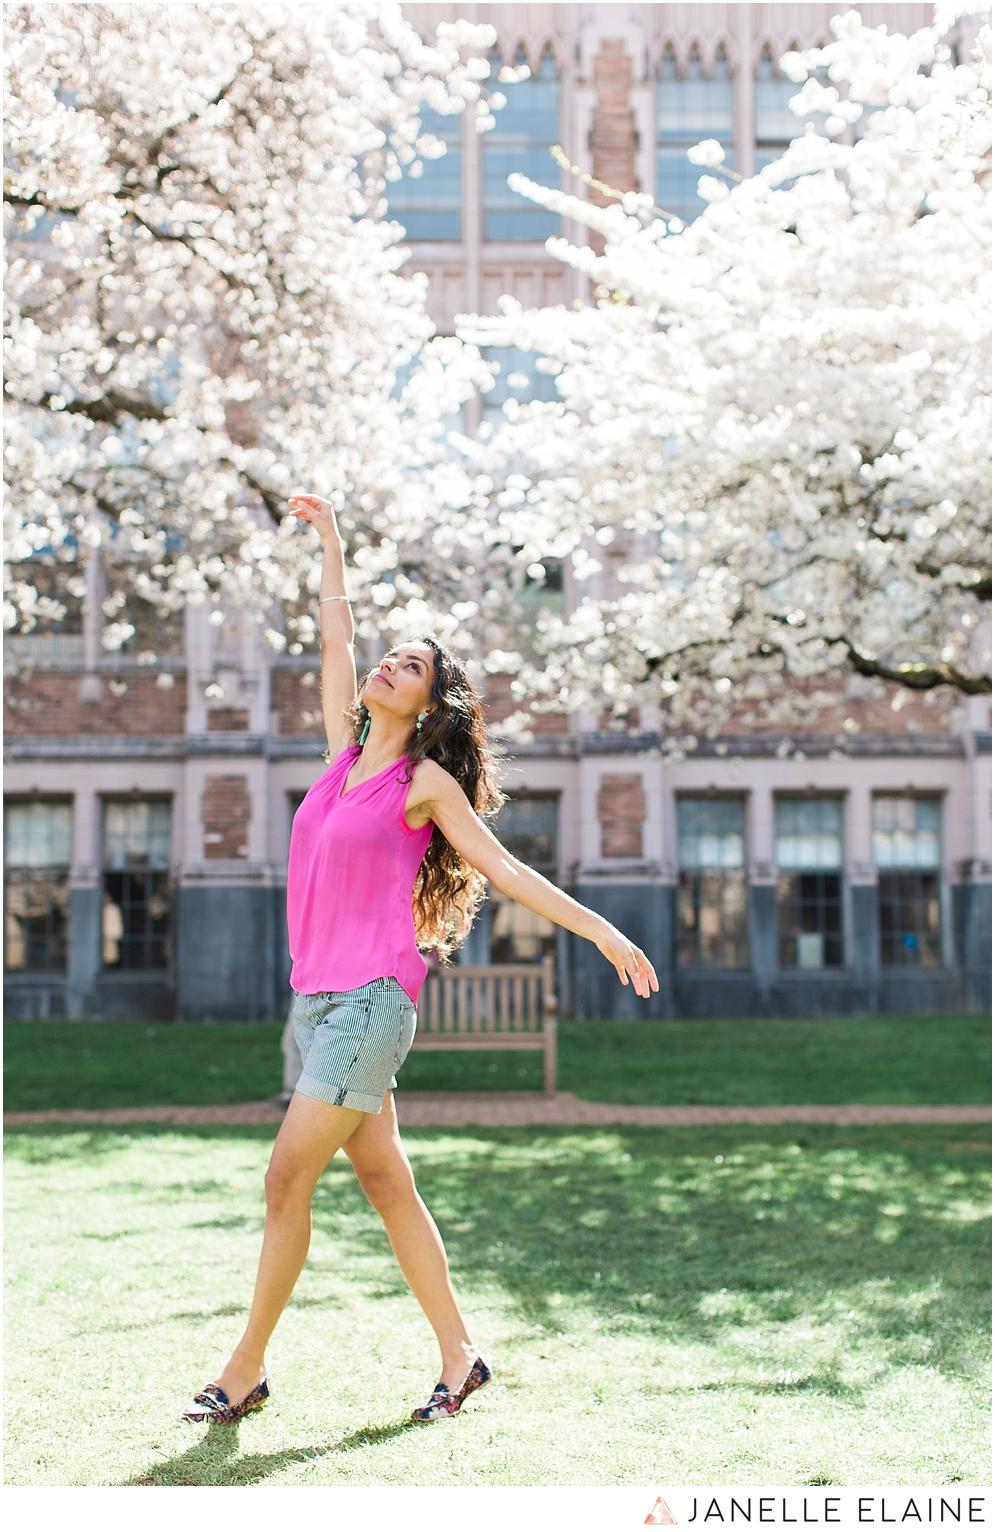 Sufience-Harkirat-spring portrait session-cherry blossoms-uw-seattle photographer janelle elaine-124.jpg